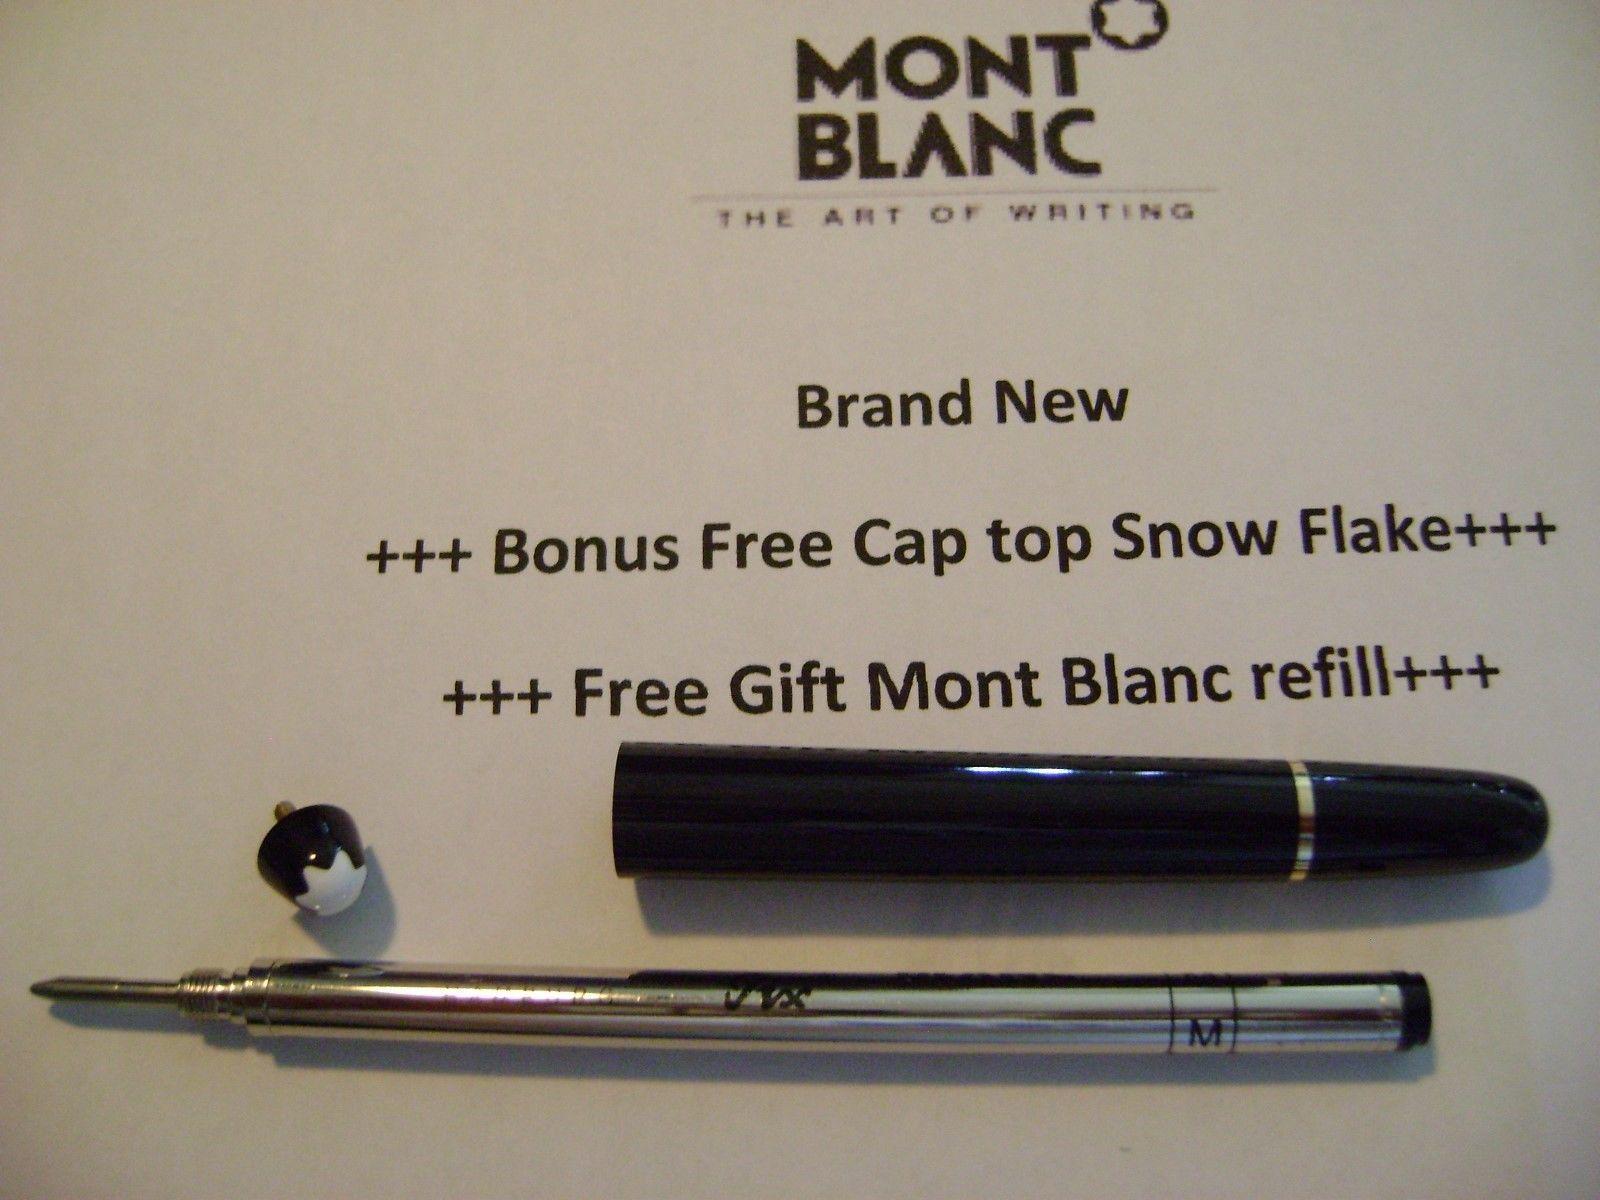 Parts Replacement Pen Barrel Platinum Trim Montblanc for 144 /163 Rollerball +